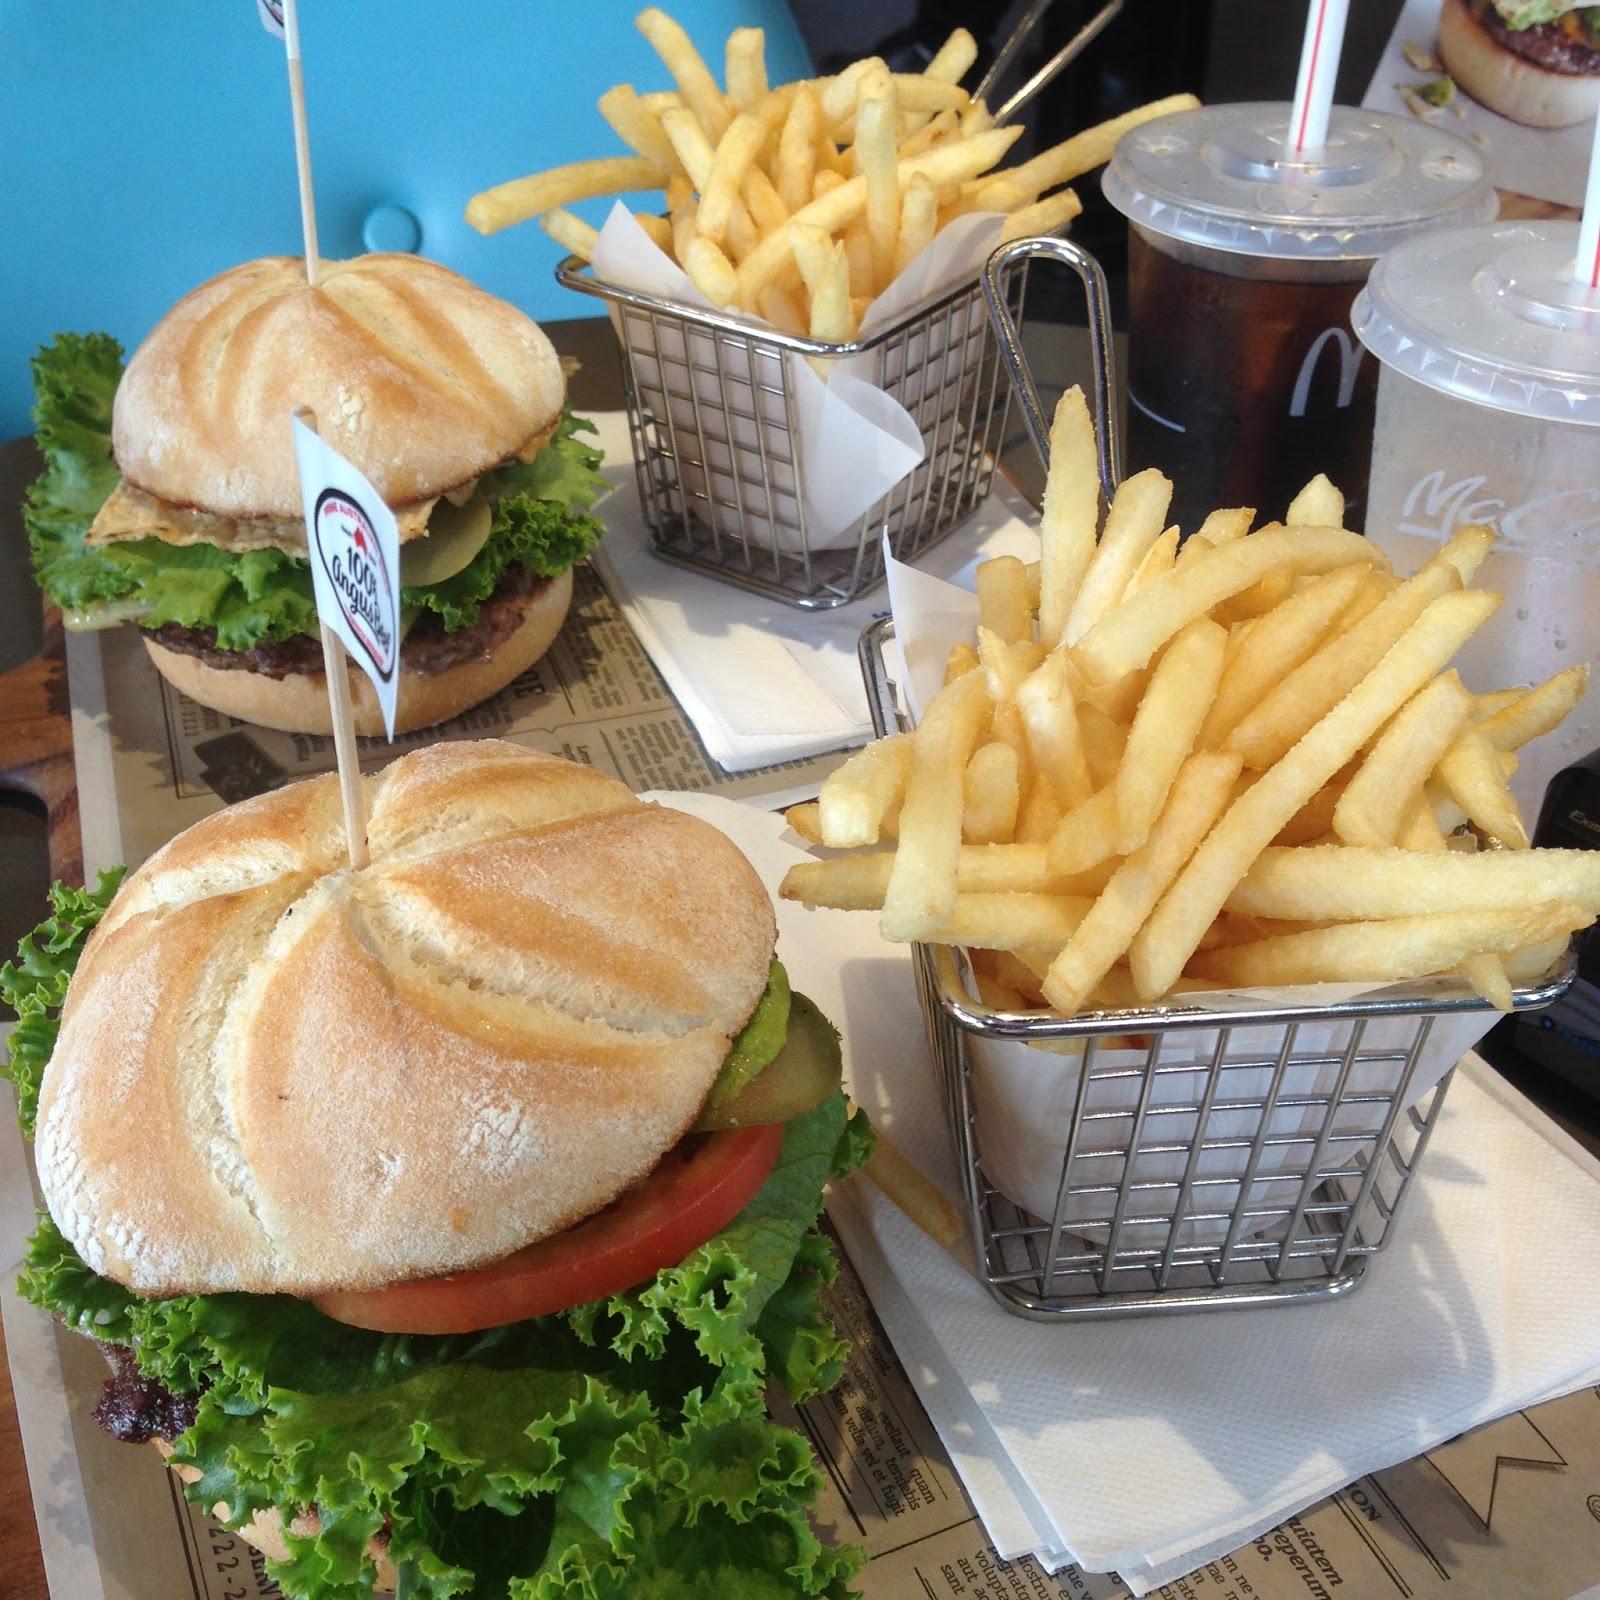 mcdonalds, create your taste, adelaide, food, port adelaide, fries, burgers, soda, custom